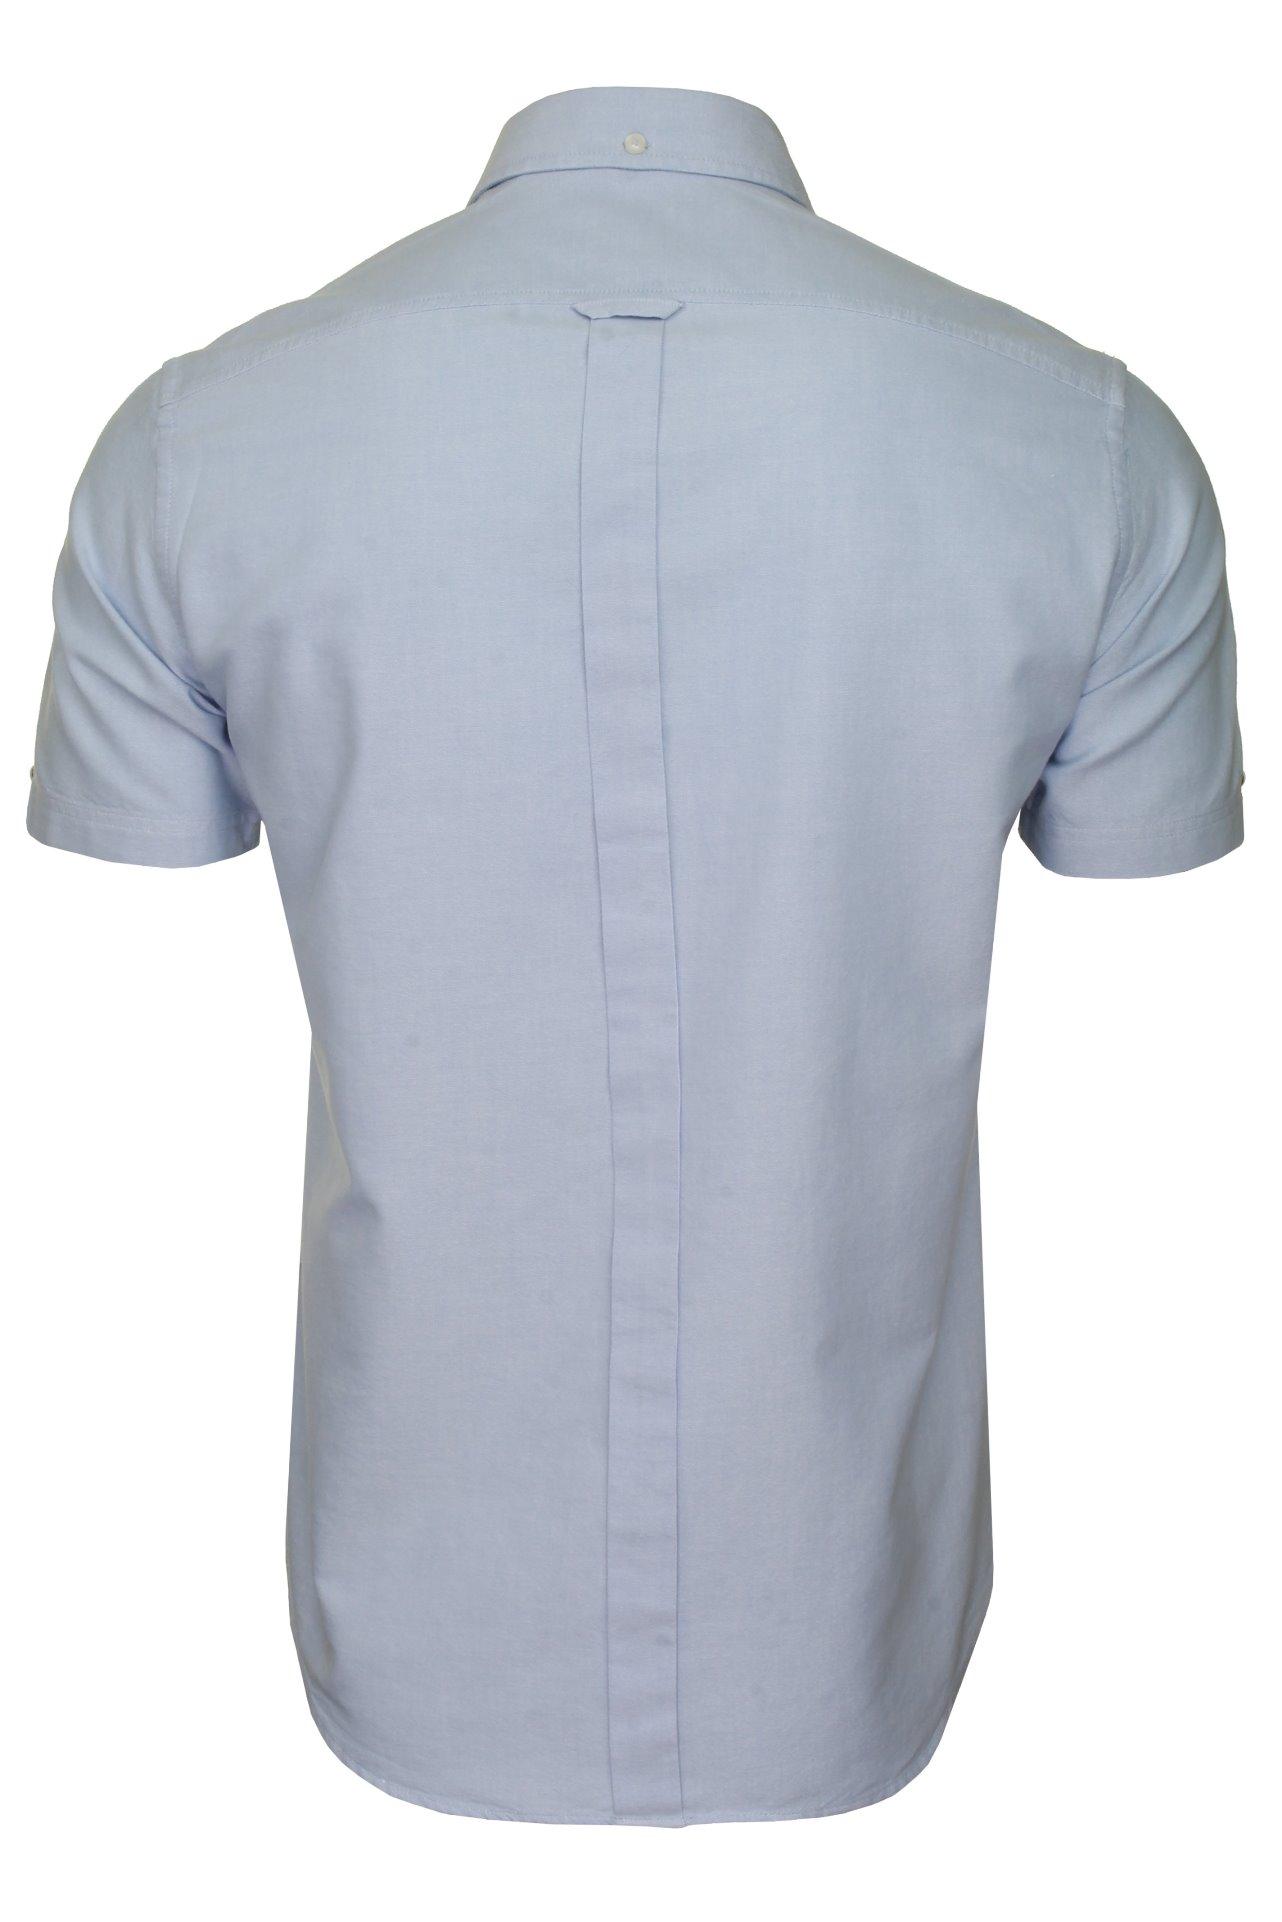 Ben-Sherman-Mens-Oxford-Shirt-Short-Sleeve thumbnail 35